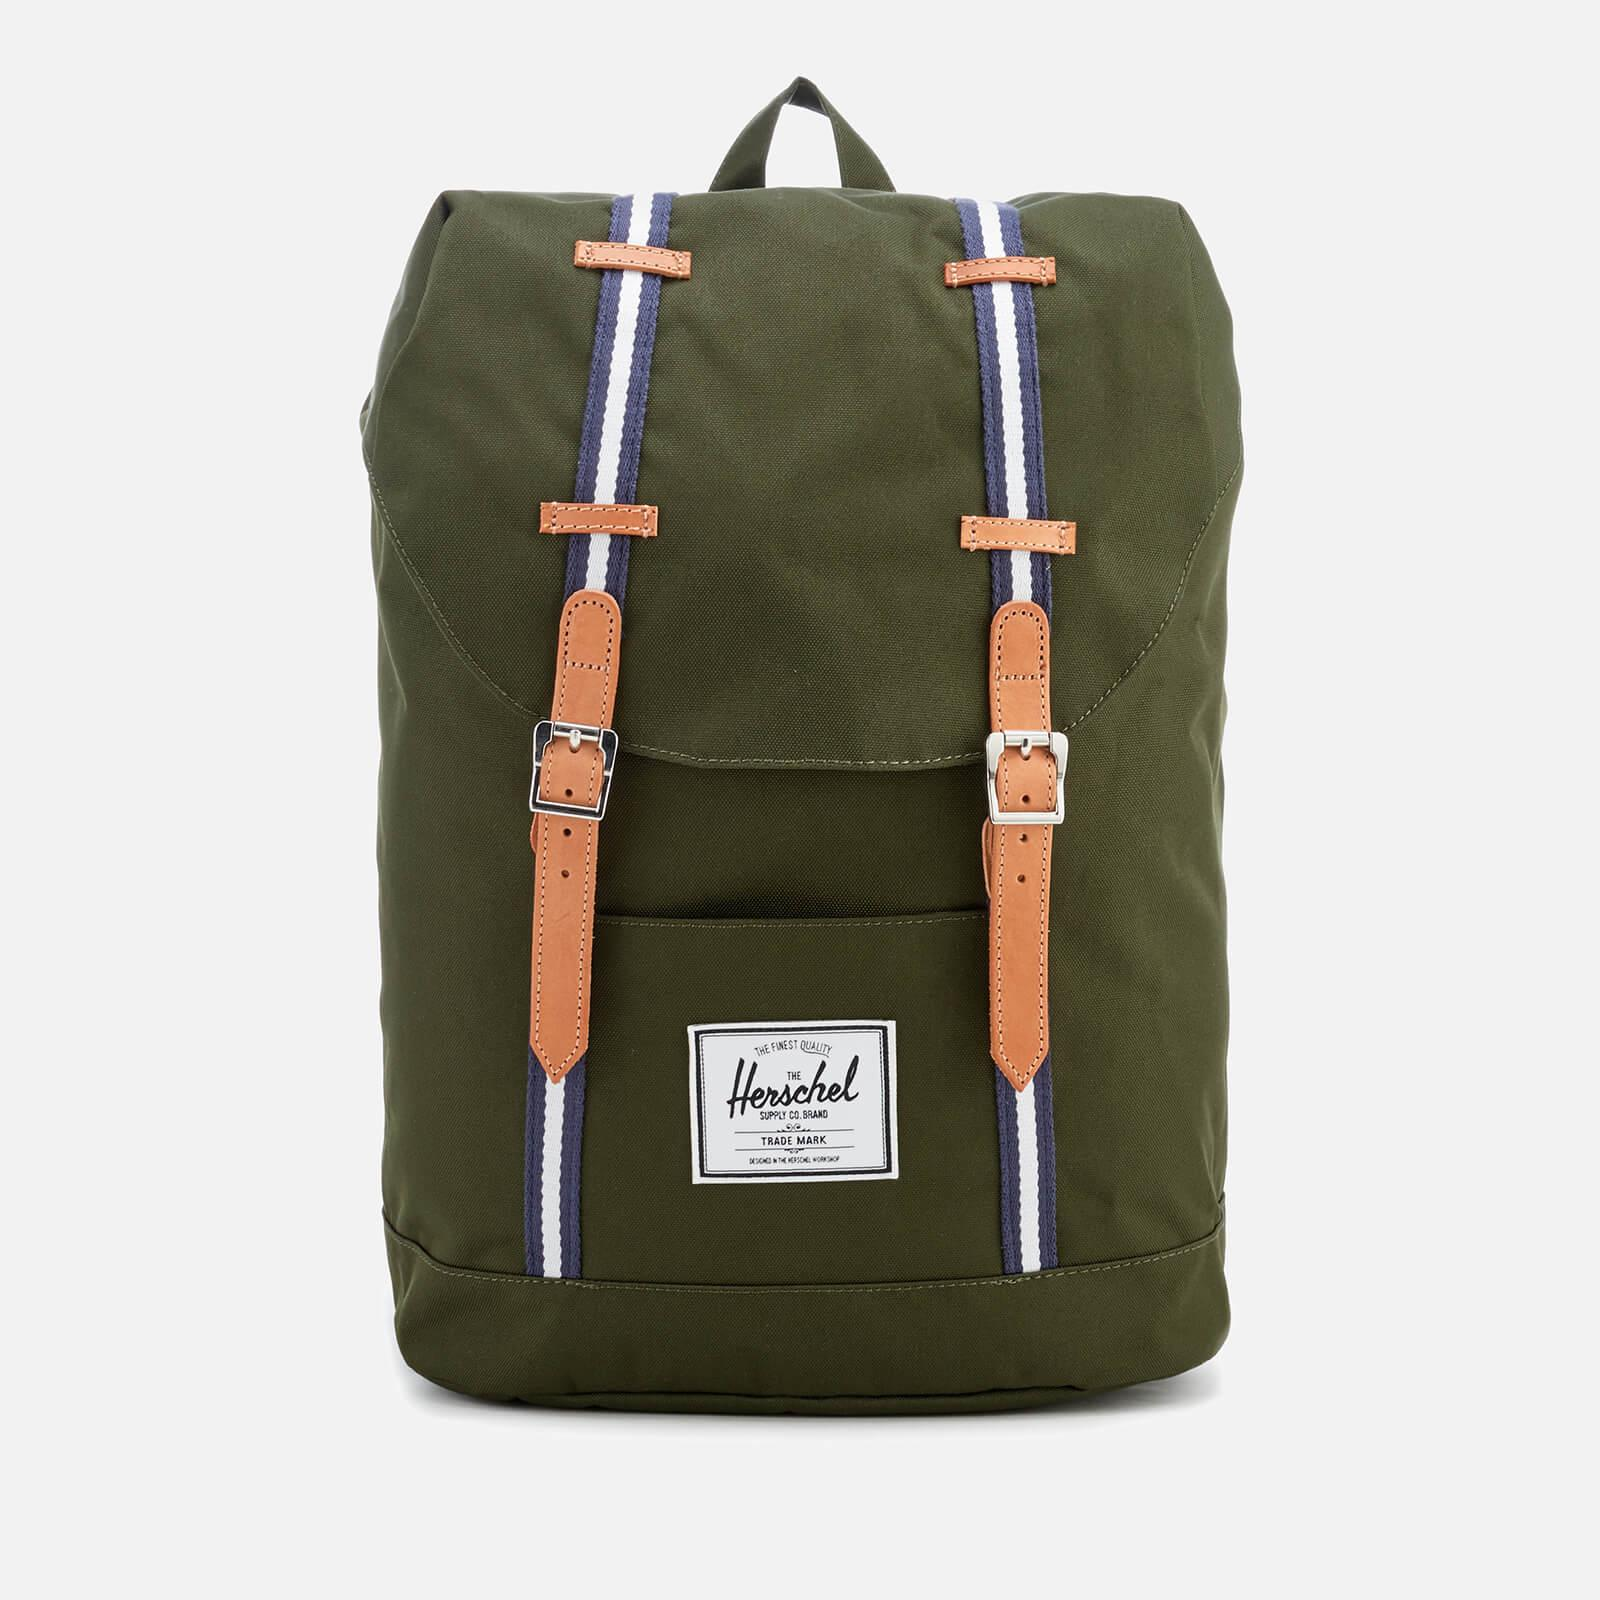 lyst herschel supply co retreat backpack in green for men. Black Bedroom Furniture Sets. Home Design Ideas